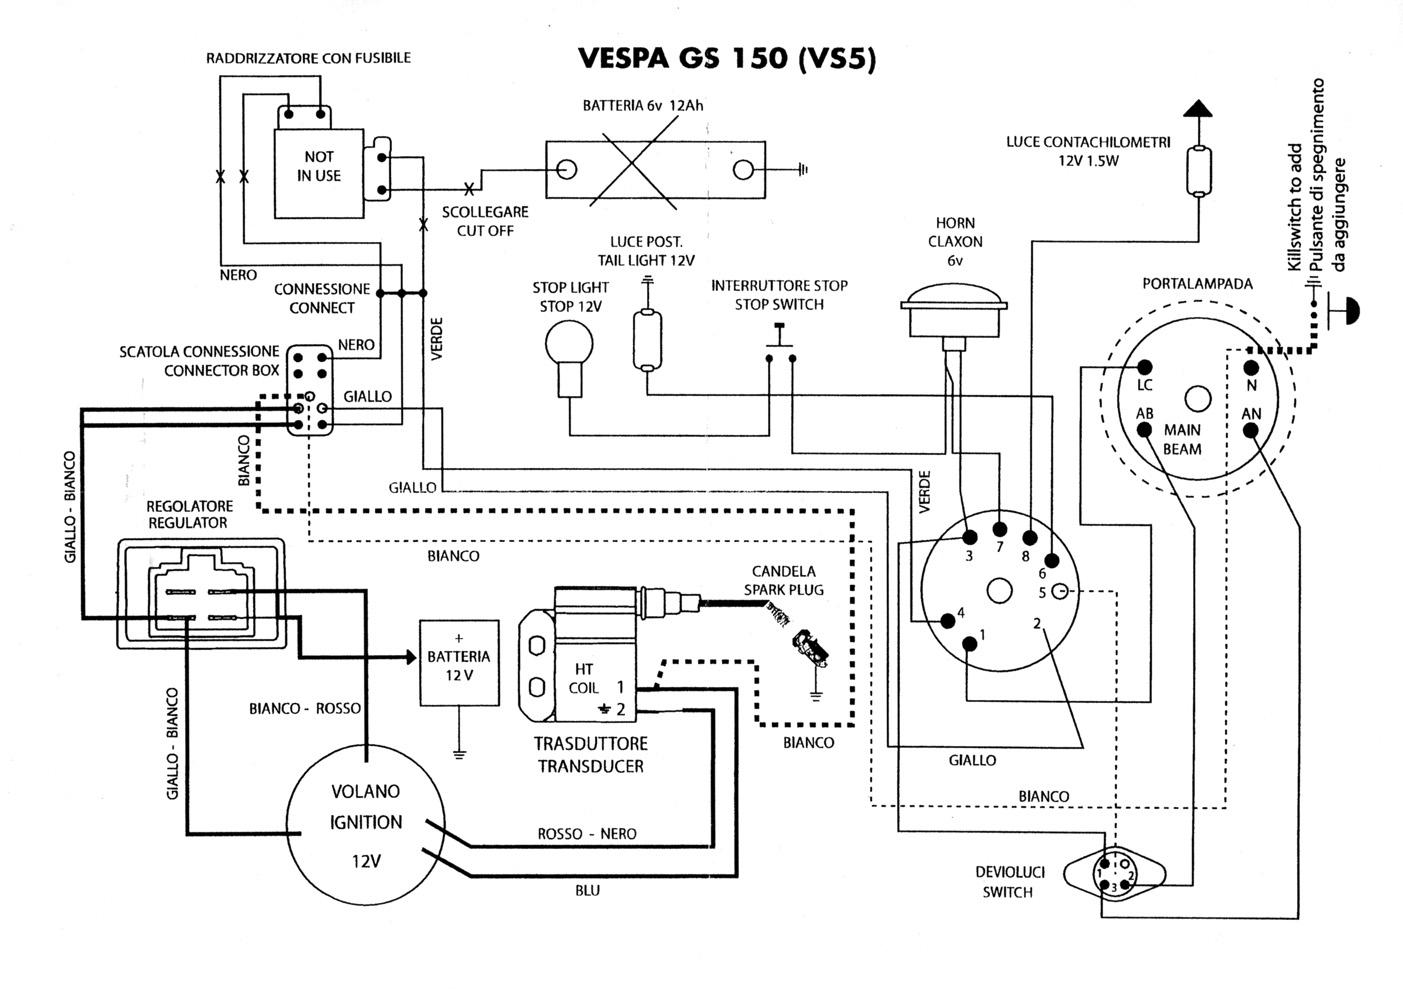 Vespa GS 150 mit FlytechConversionbaum  Vespa Rally  Sprint  VNA  VNB  VBB  V125  etc  GSF